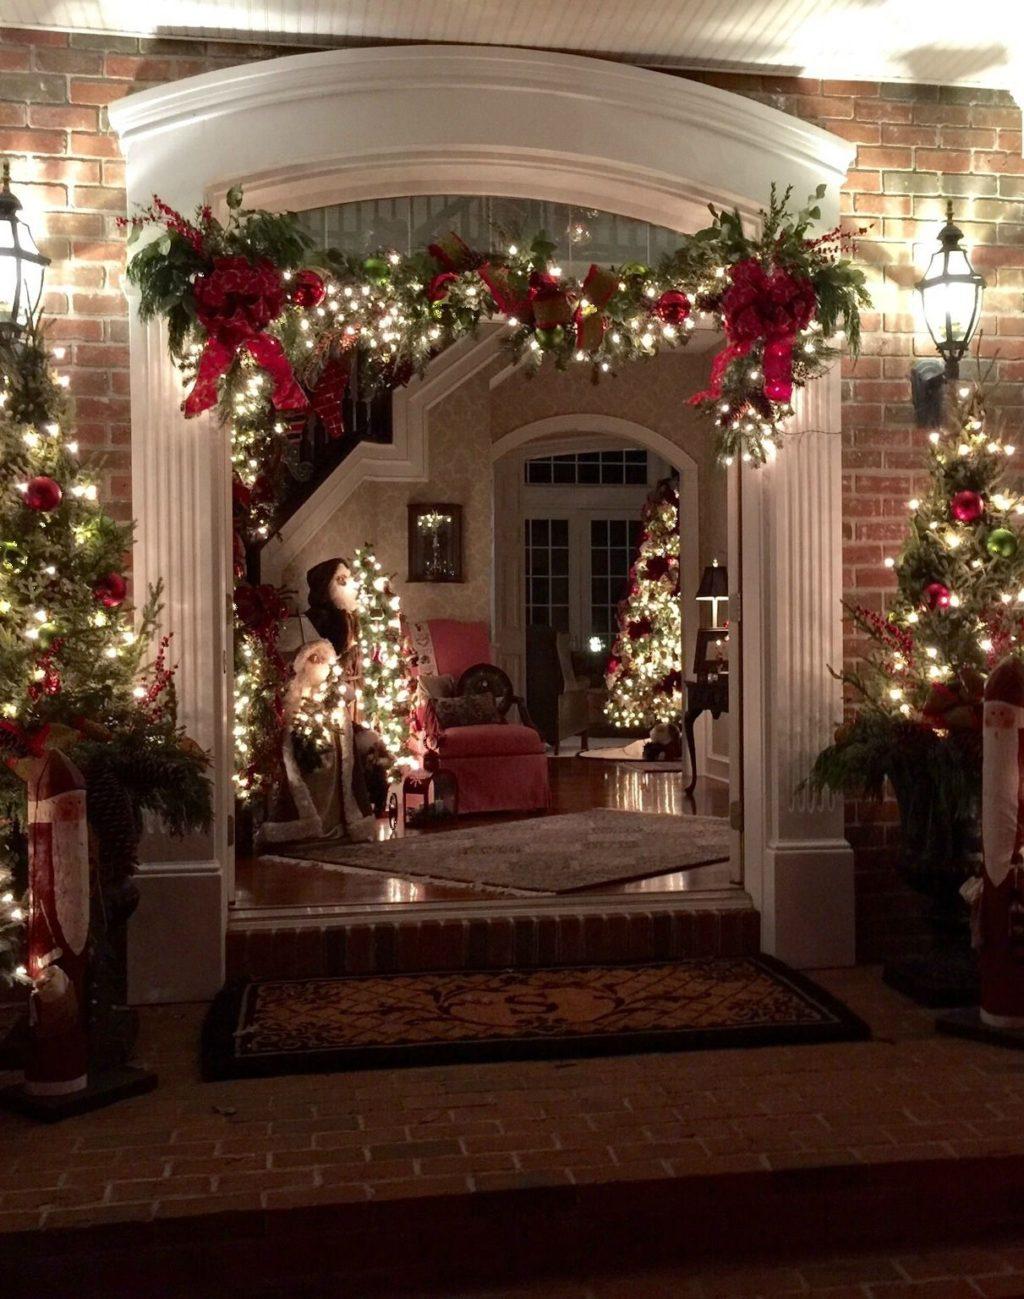 Christmas-lights-2-1024x1299 How to Bring Joy to Your Home at This Christmas Season